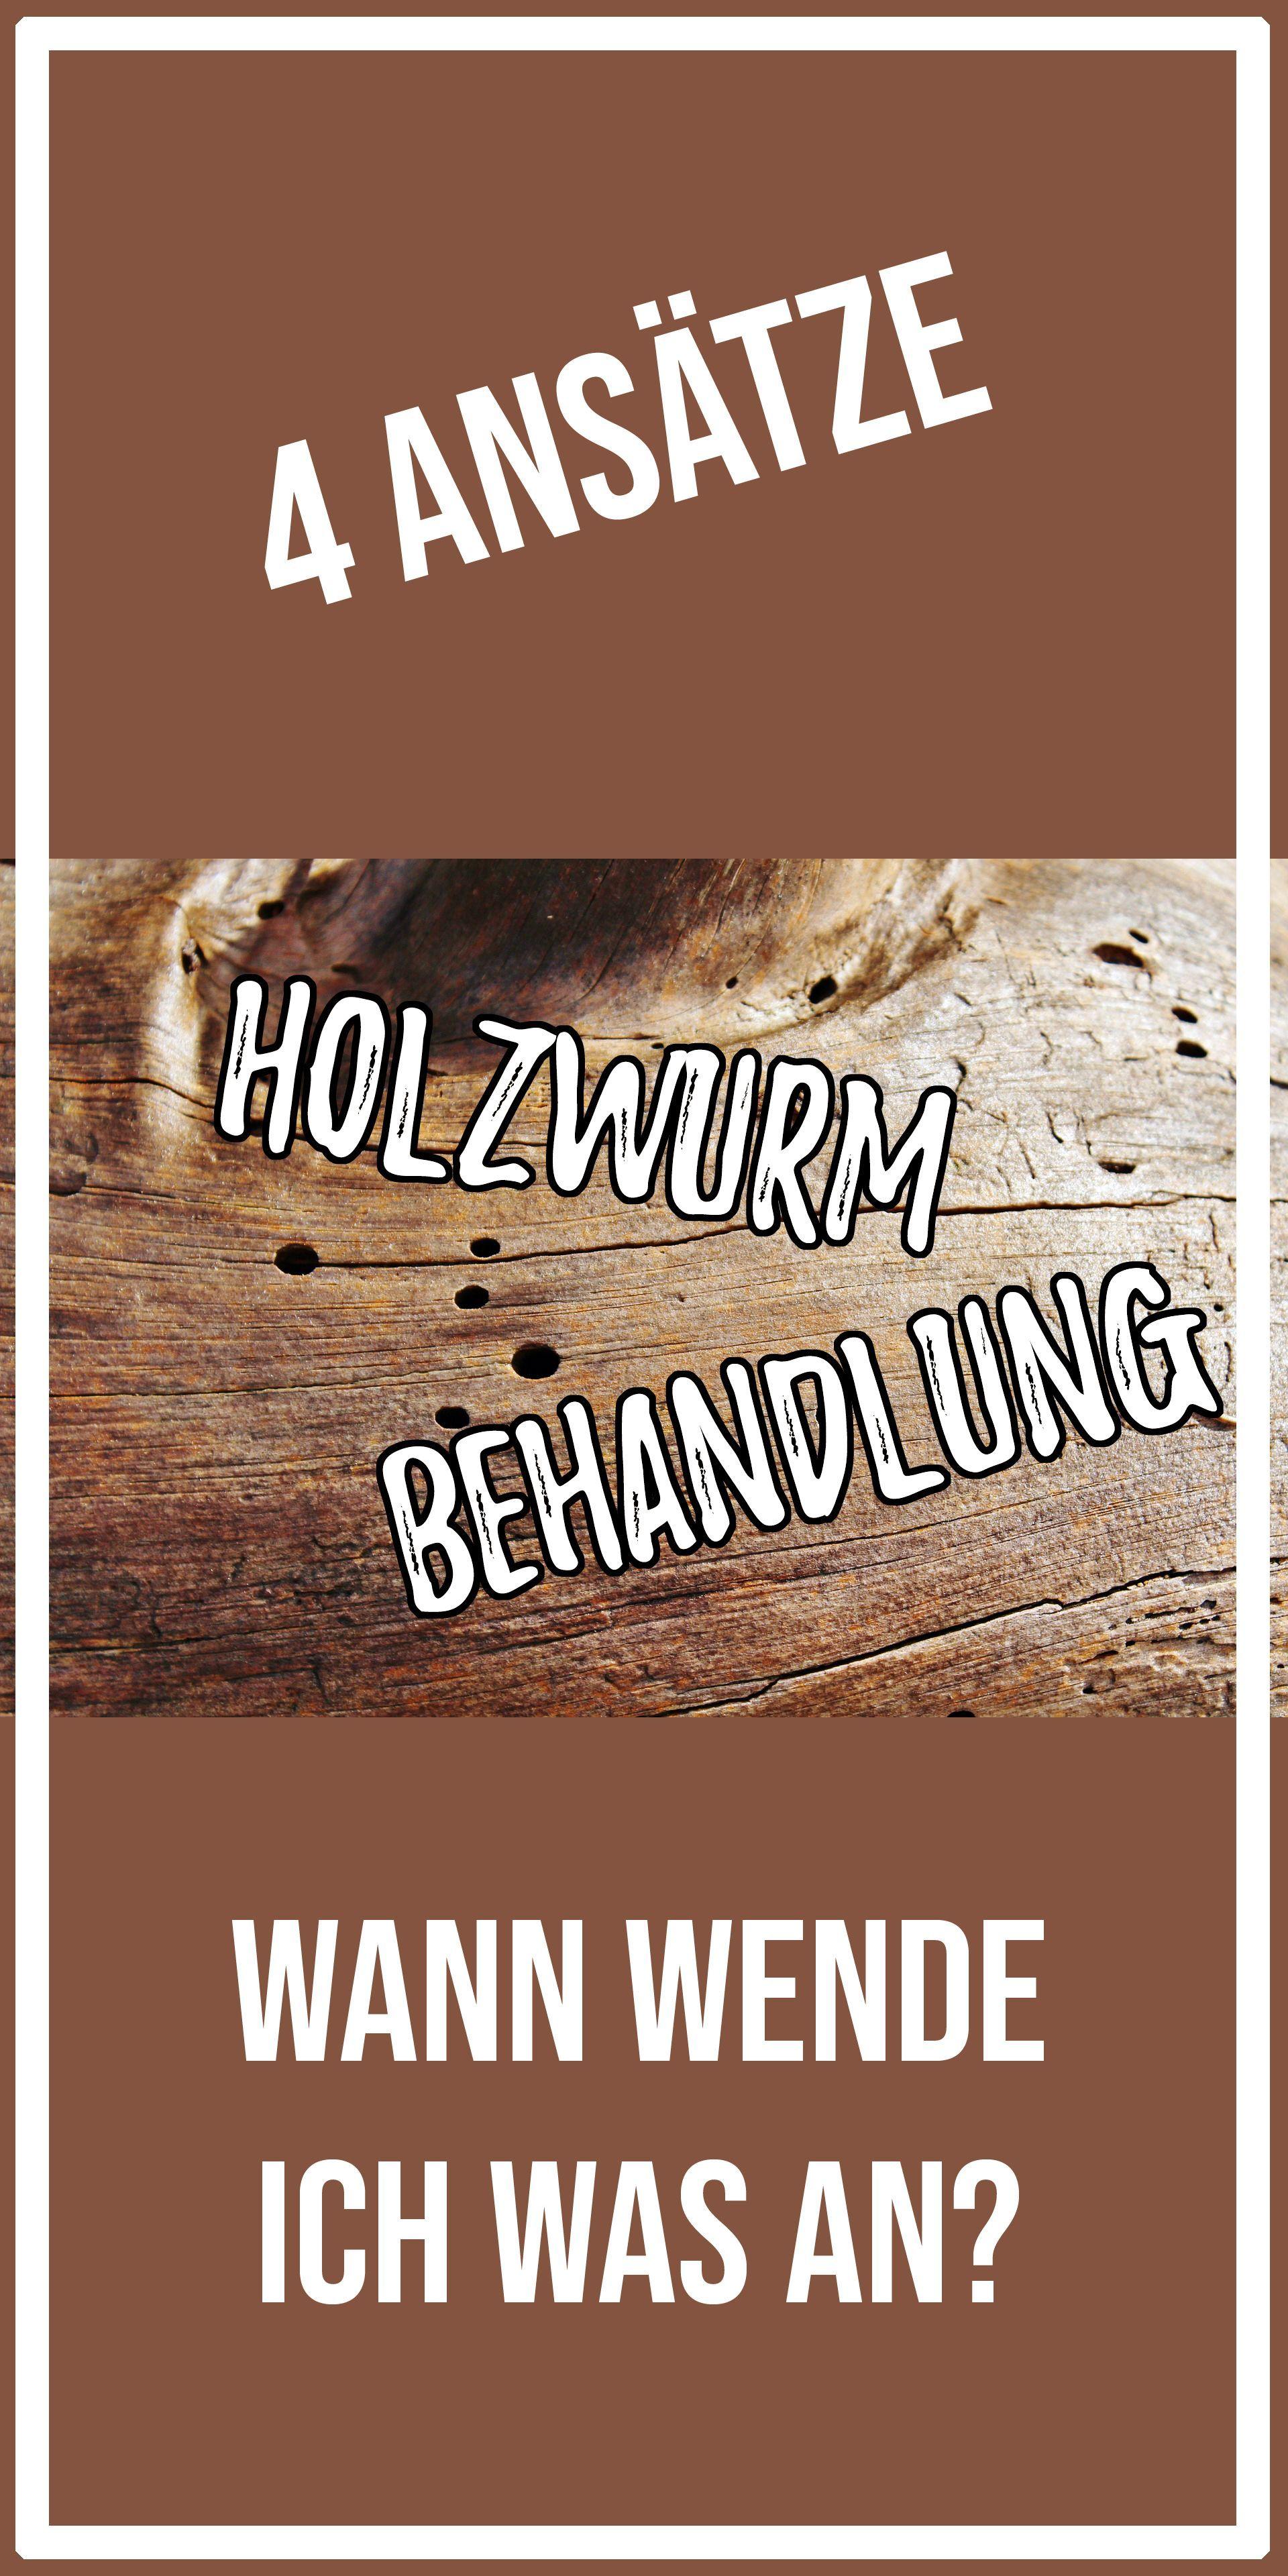 Holzwurm Behandeln Bzw Bekampfen 4 Ansatze Um Den Holz Schadling Loszuwerd Holzwurm Behandeln Bzw Bekampfen 4 Ans In 2020 Holzwurm Holzwurmer Bekampfen Holz